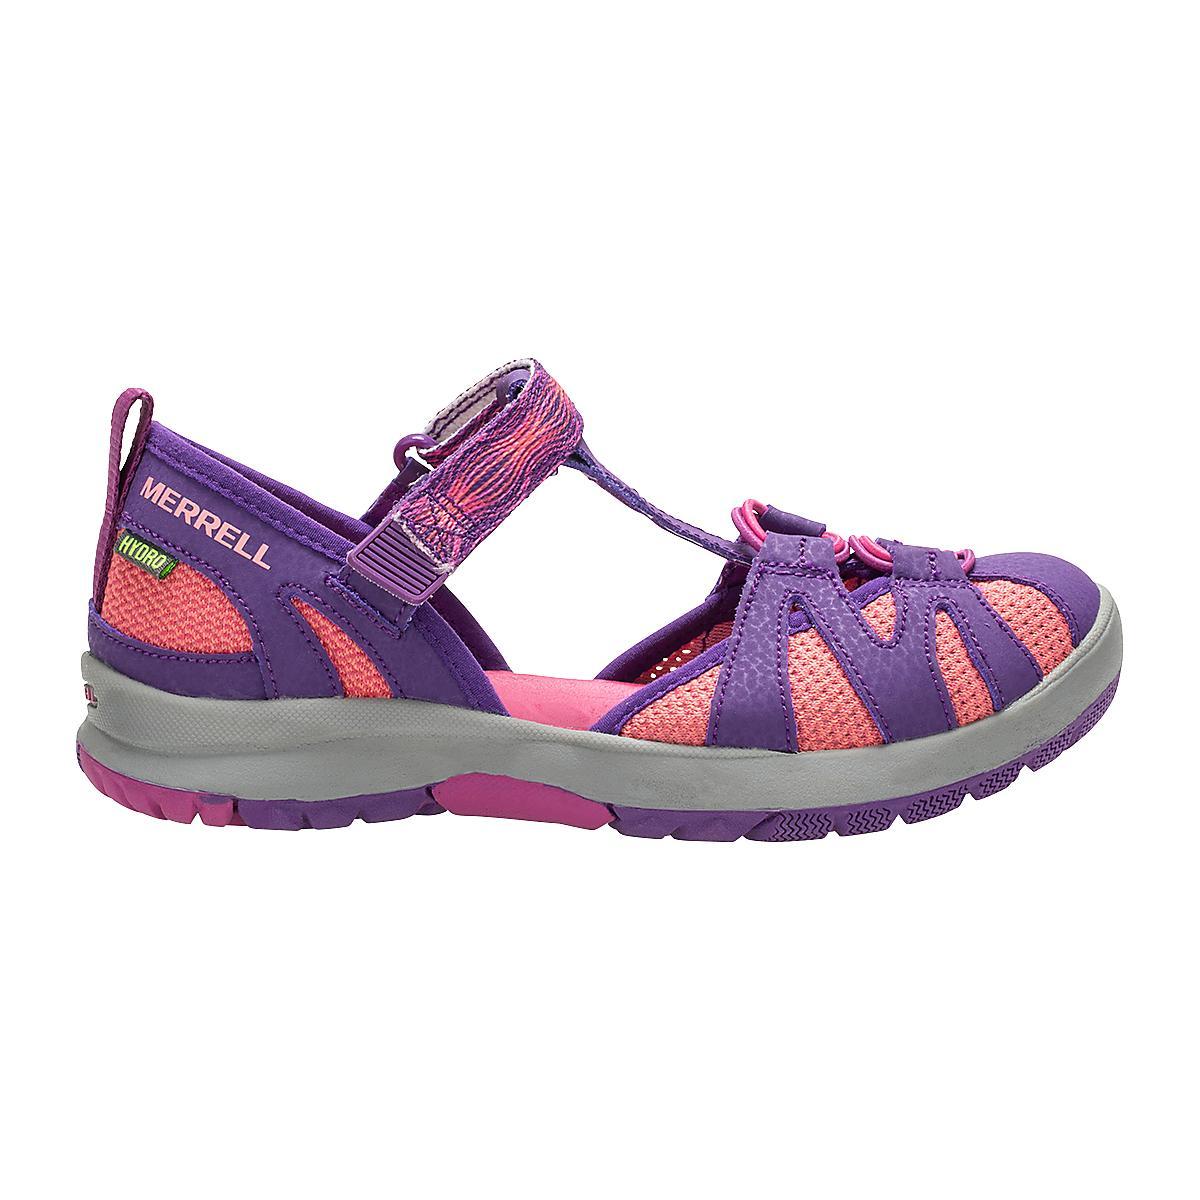 cc80cd3b66f4 Kids Merrell Hydro Monarch 2.0 Sandals Shoe